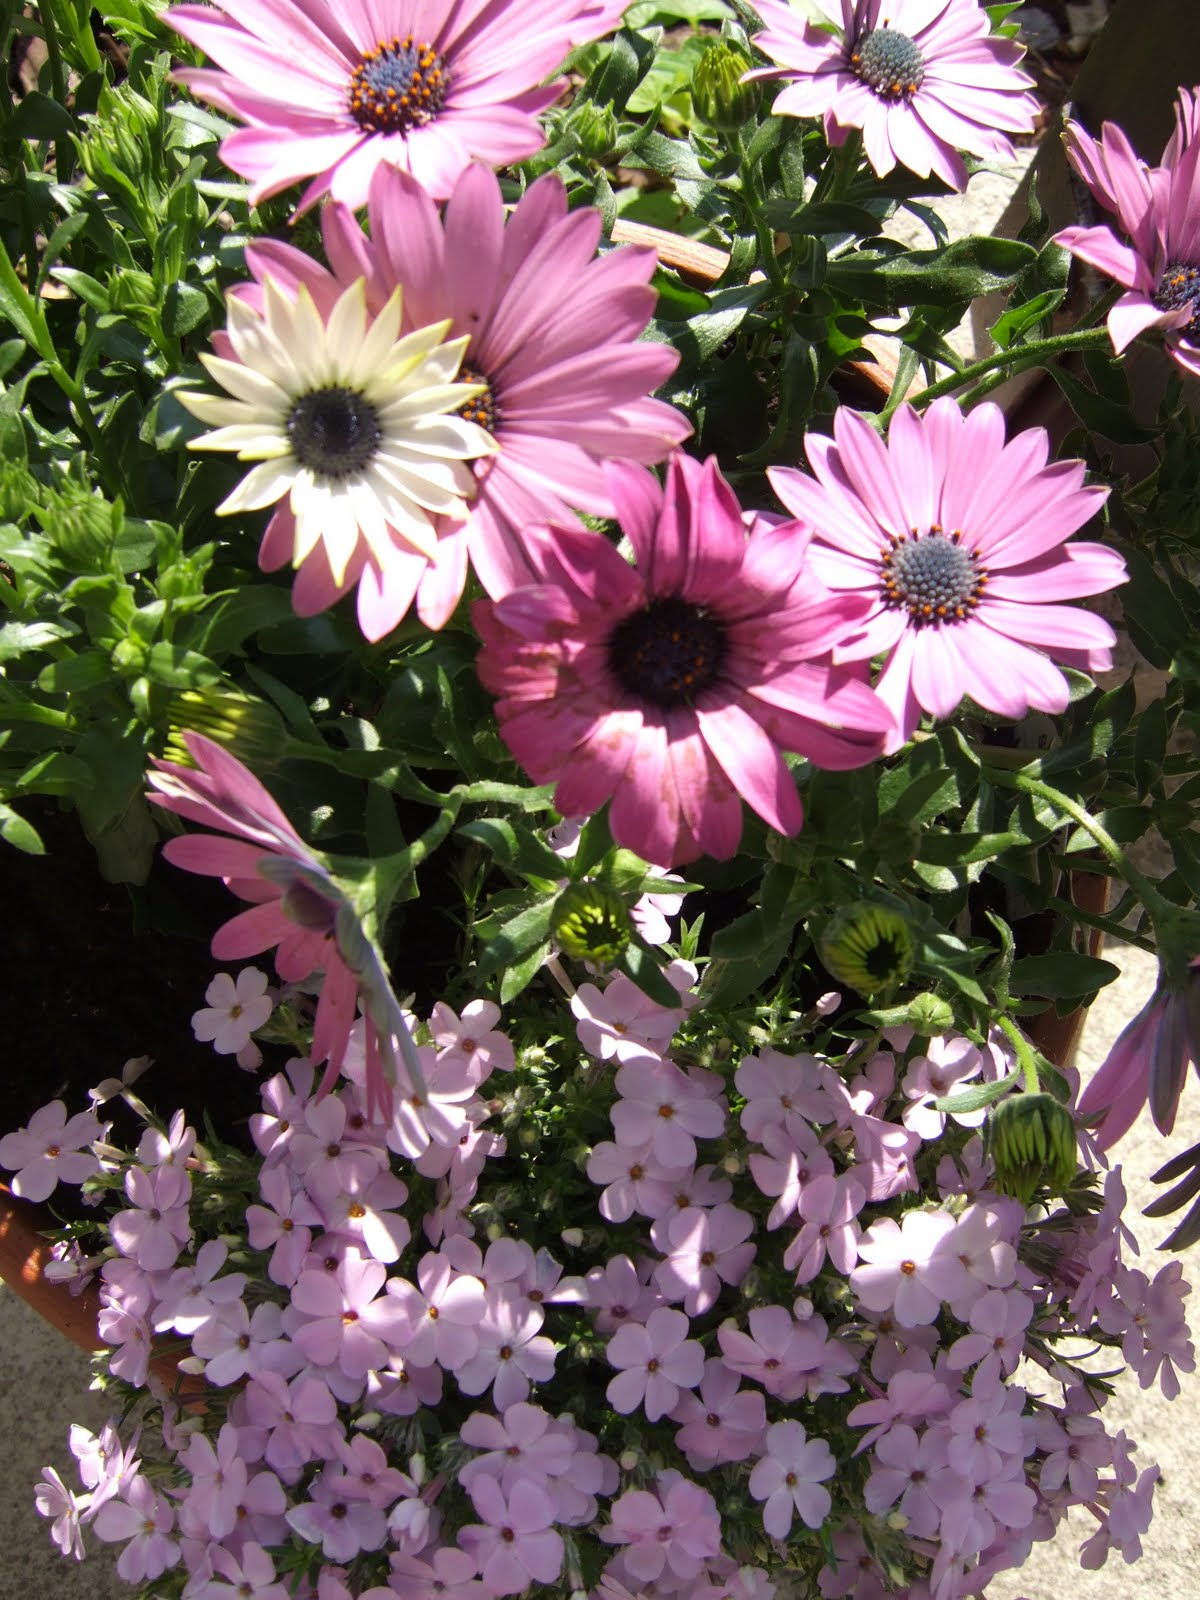 Diane Kappa Steven Greimann We Must Cultivate Our Garden